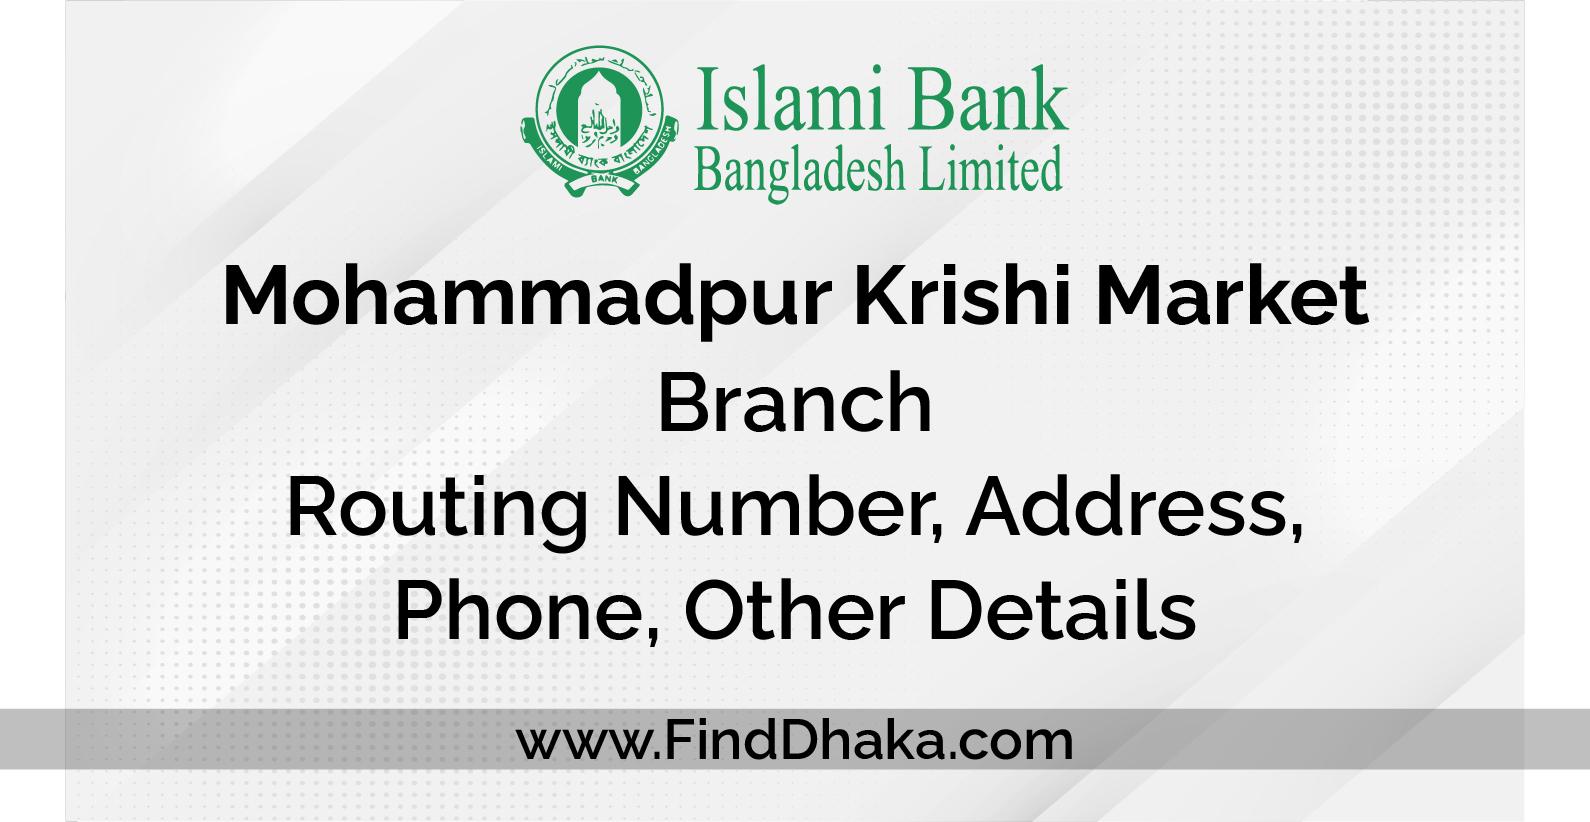 Photo of Islami Bank Mohammadpur Krishi Market Branch